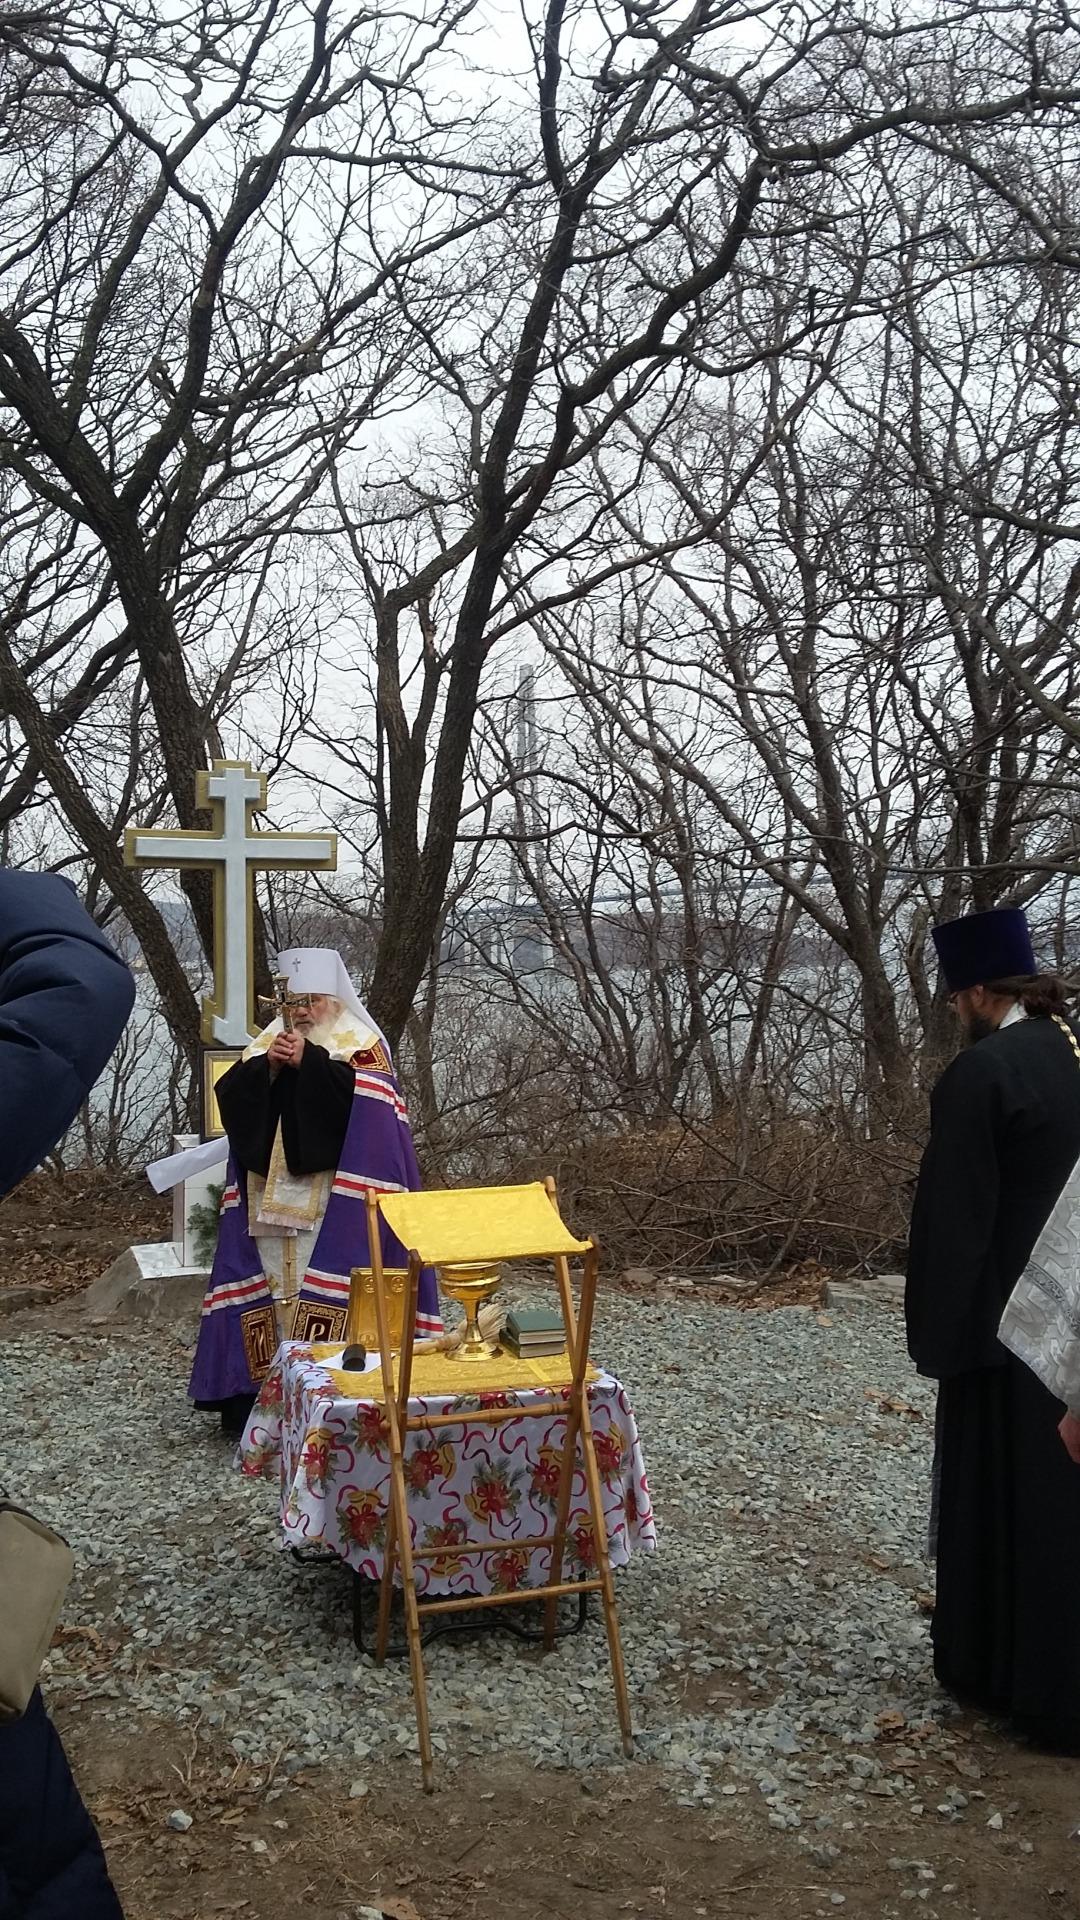 освящение креста на фундаменте храма Нерукотворного Образа Христа Спасителя близ п. Поспелово 24.11. 2017